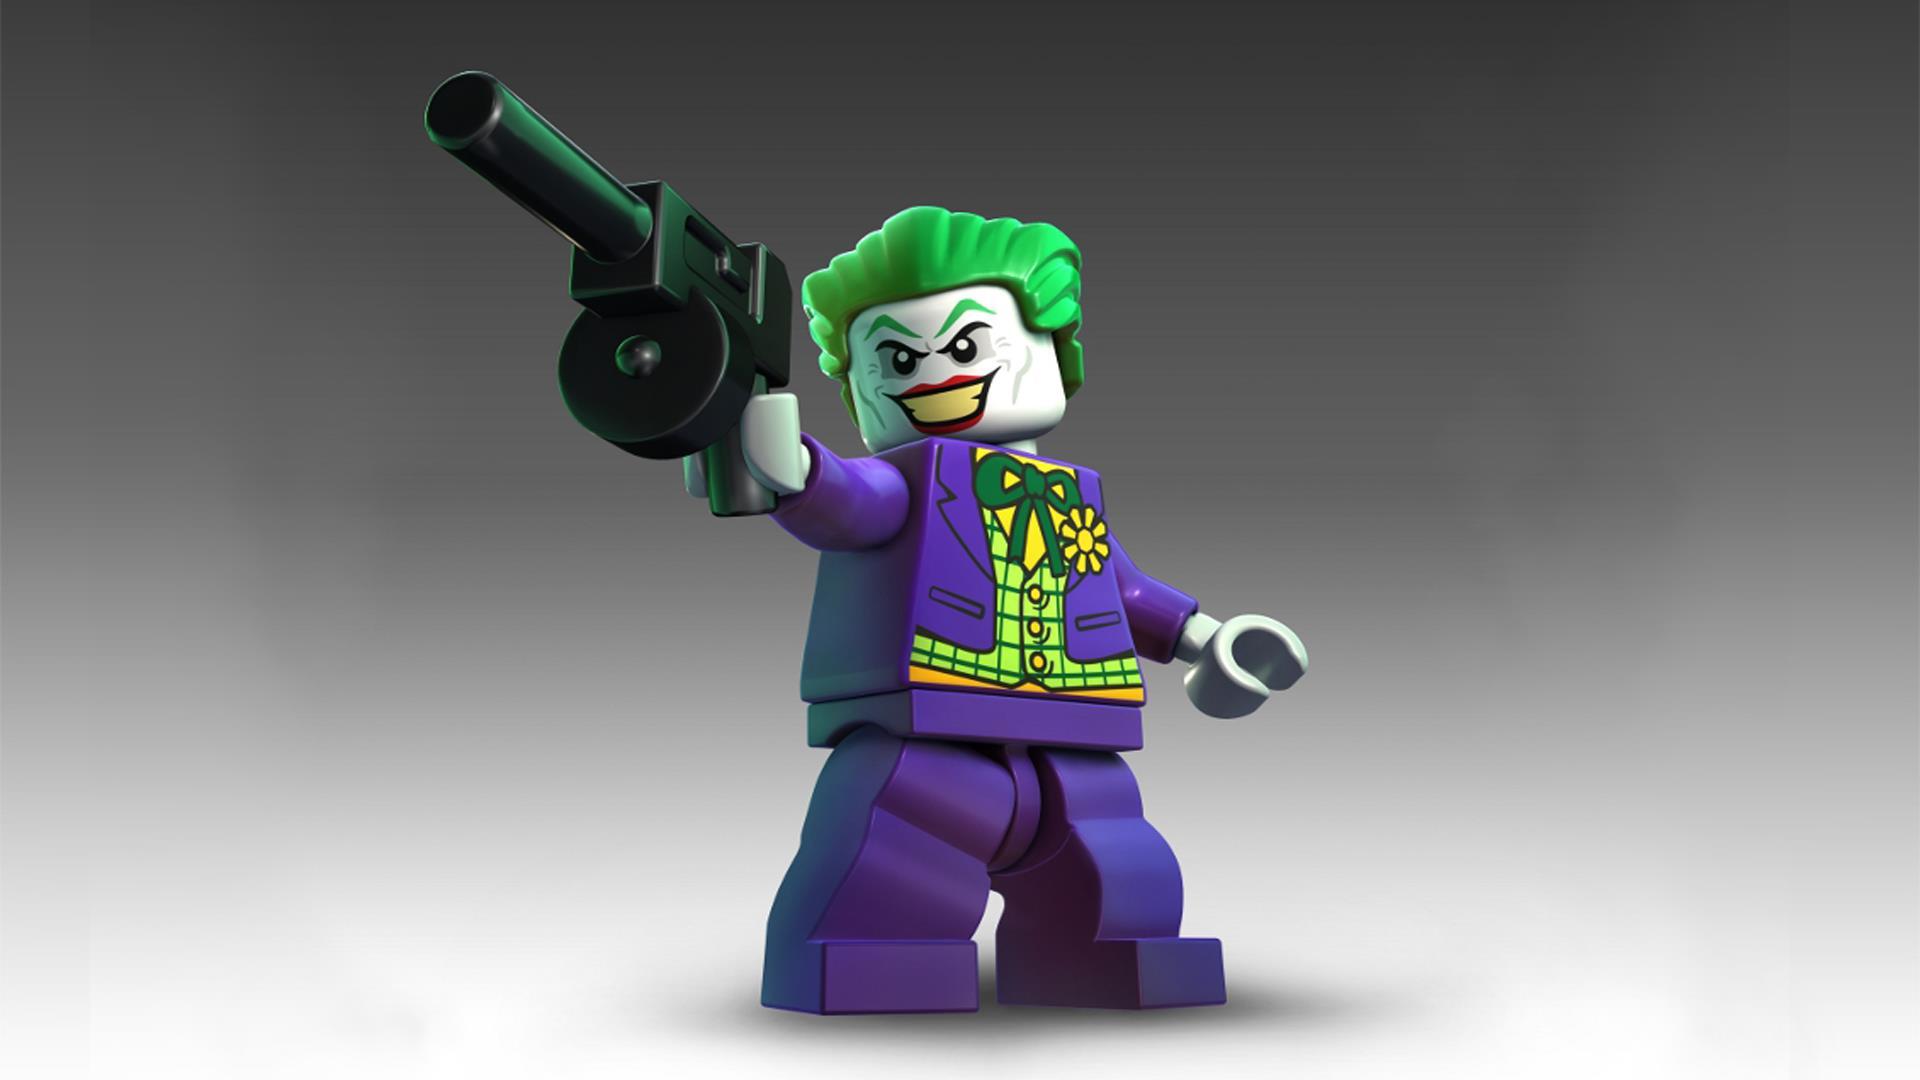 Batman Joker Lego HD Wallpaper Batman Joker Lego 1920x1080